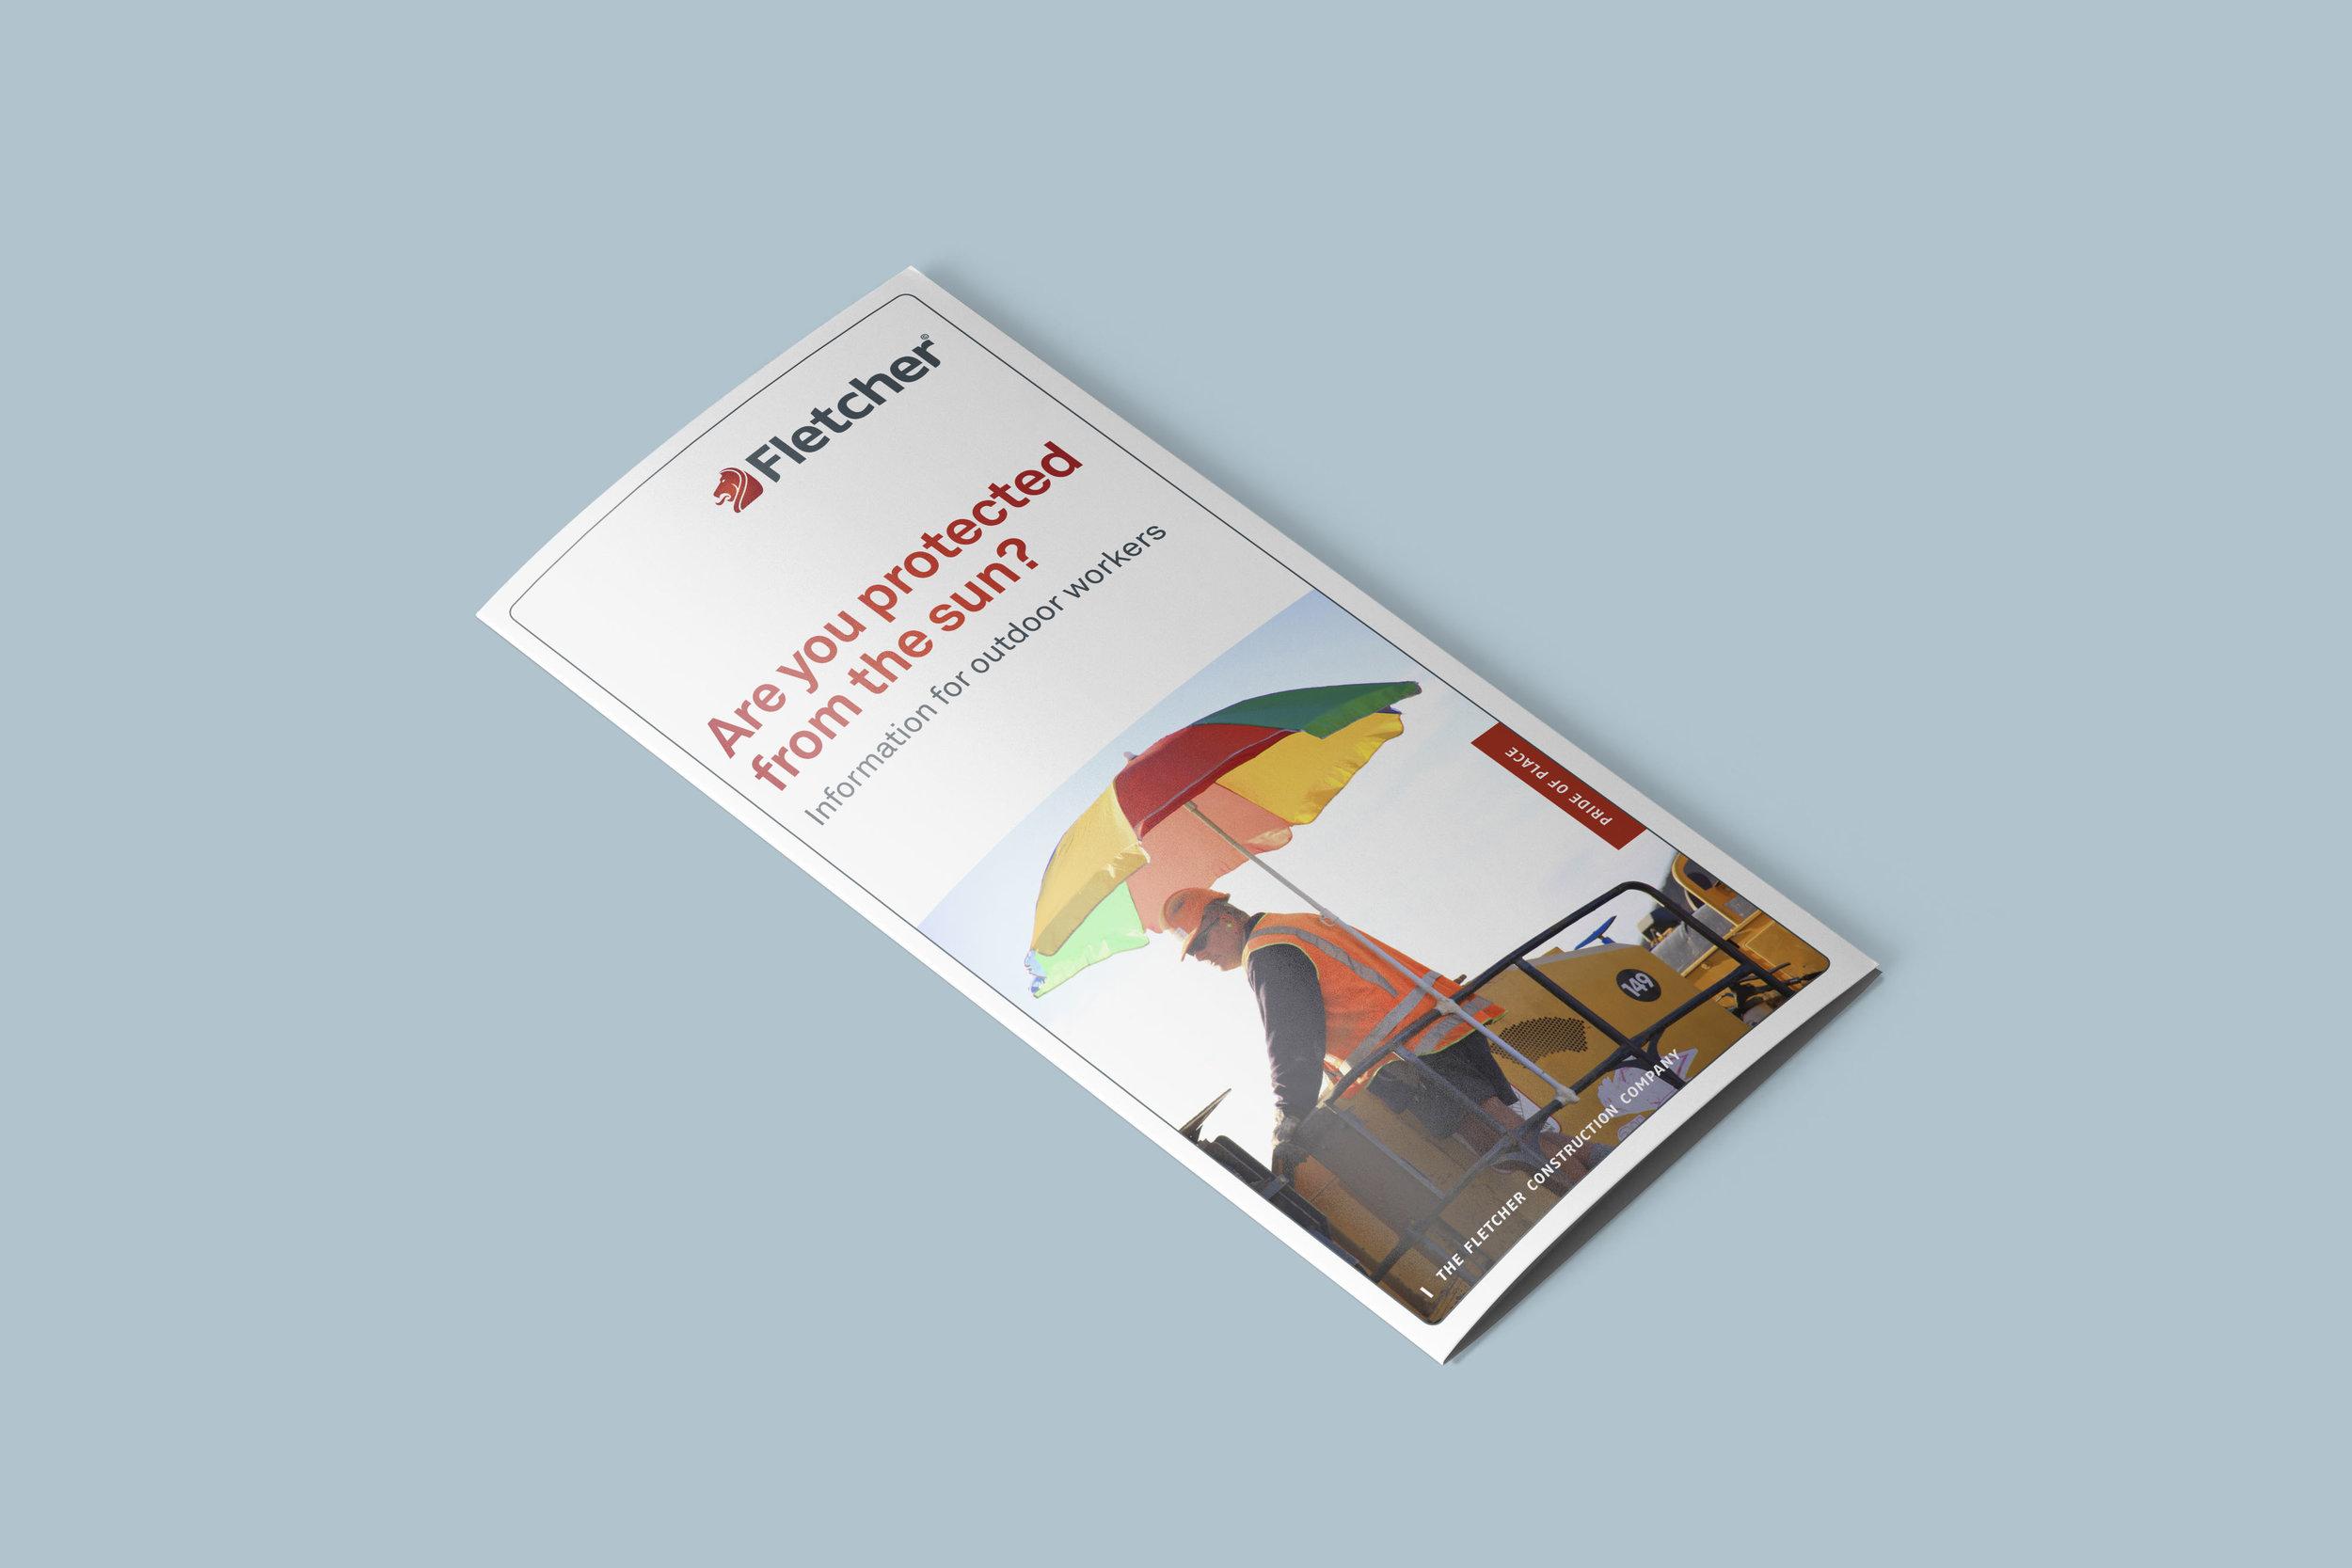 A closed tri-fold leaflet on a table